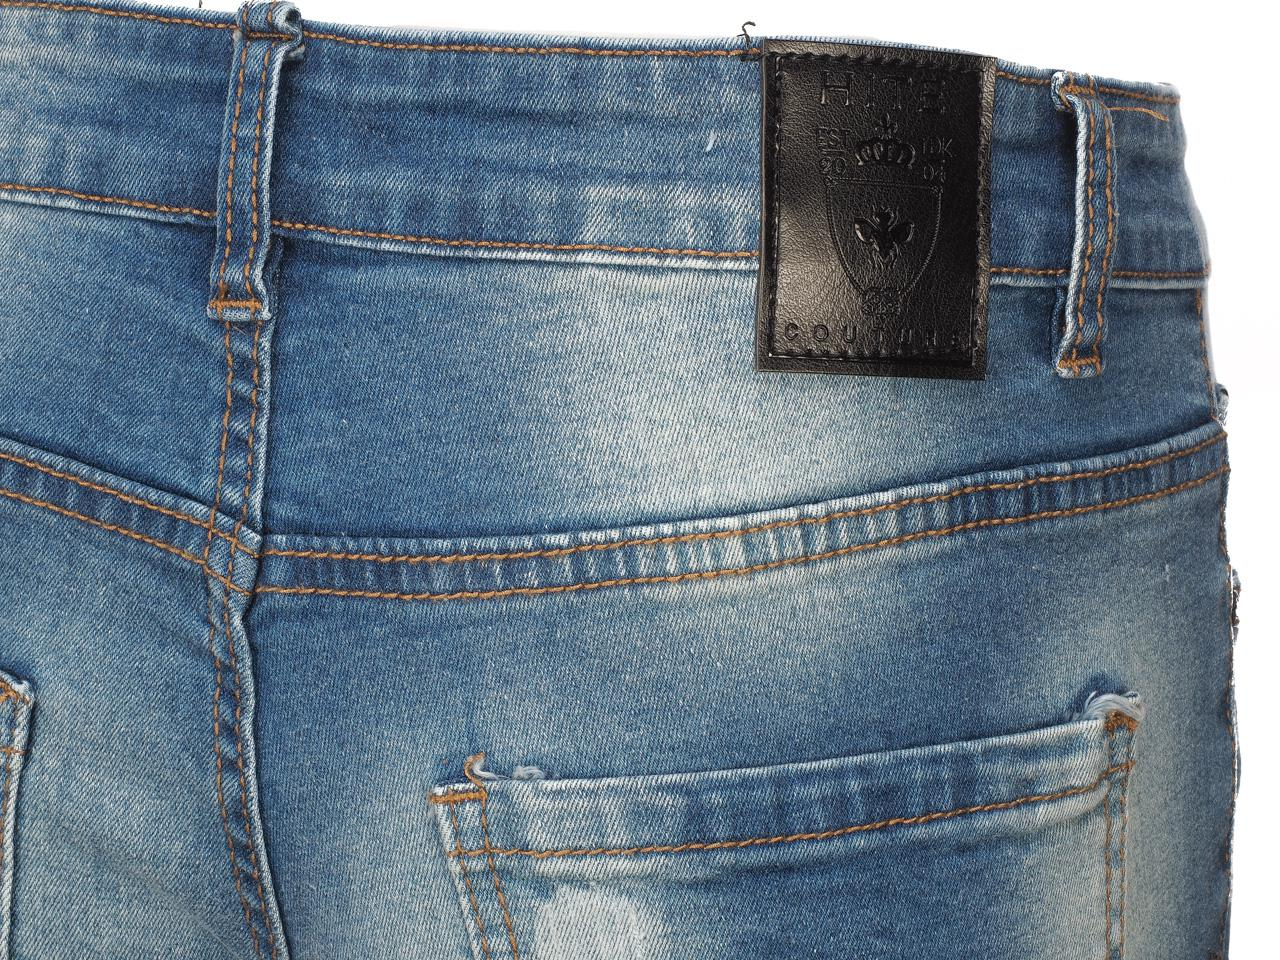 Jeans-Pants-Hite-Couture-Kimit-Blue-Blue-Jeans-56935-New thumbnail 4